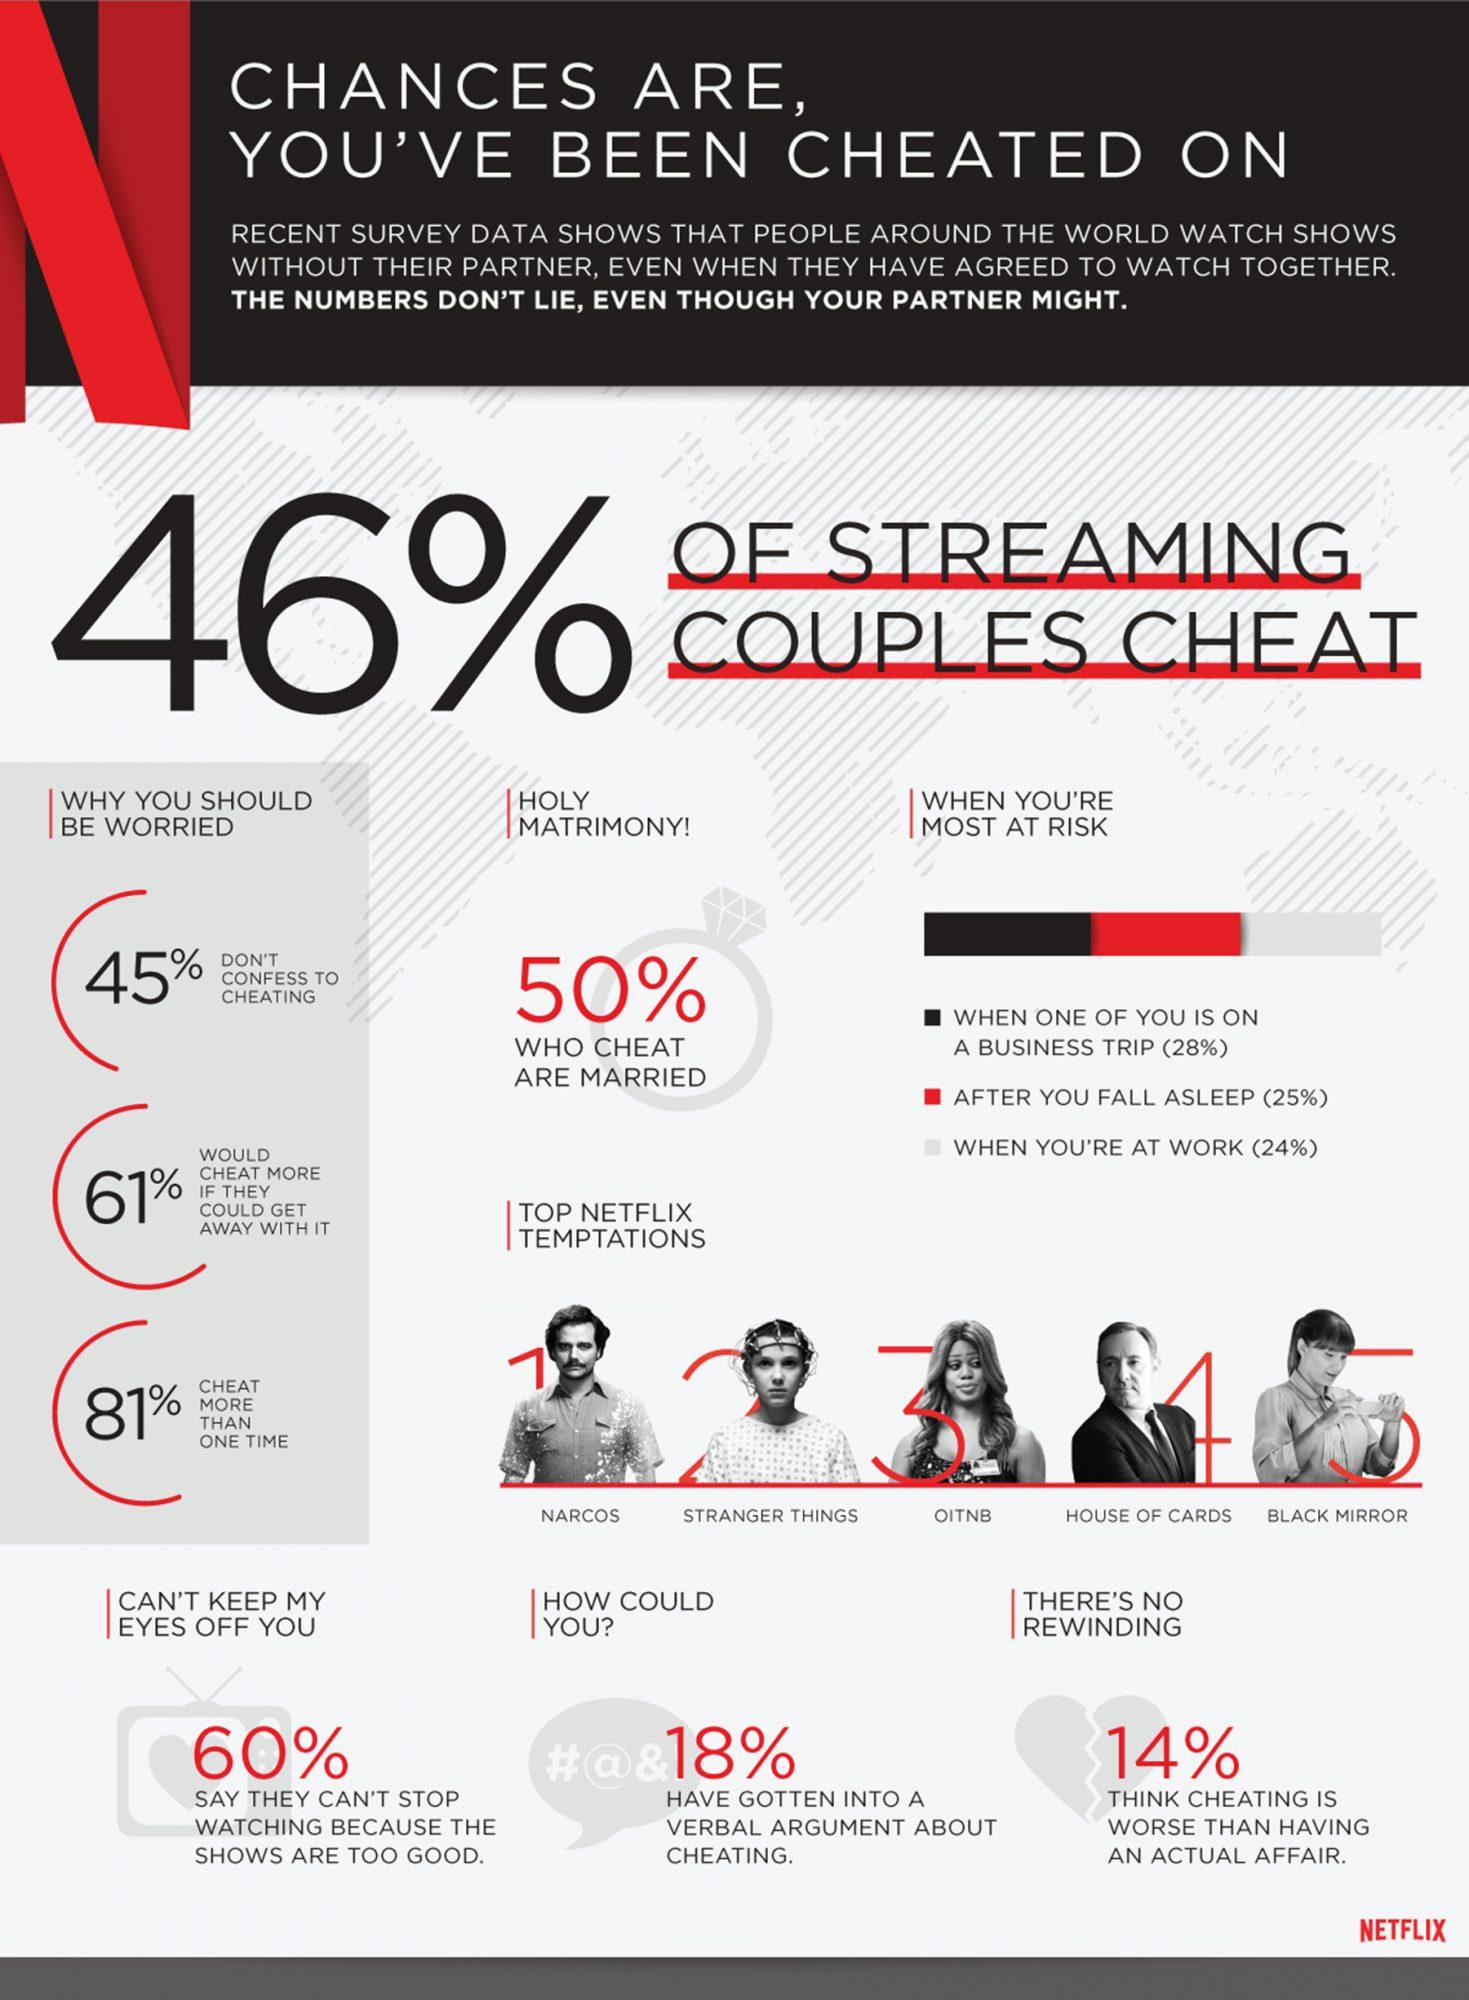 netflix_cheating_global_infographic